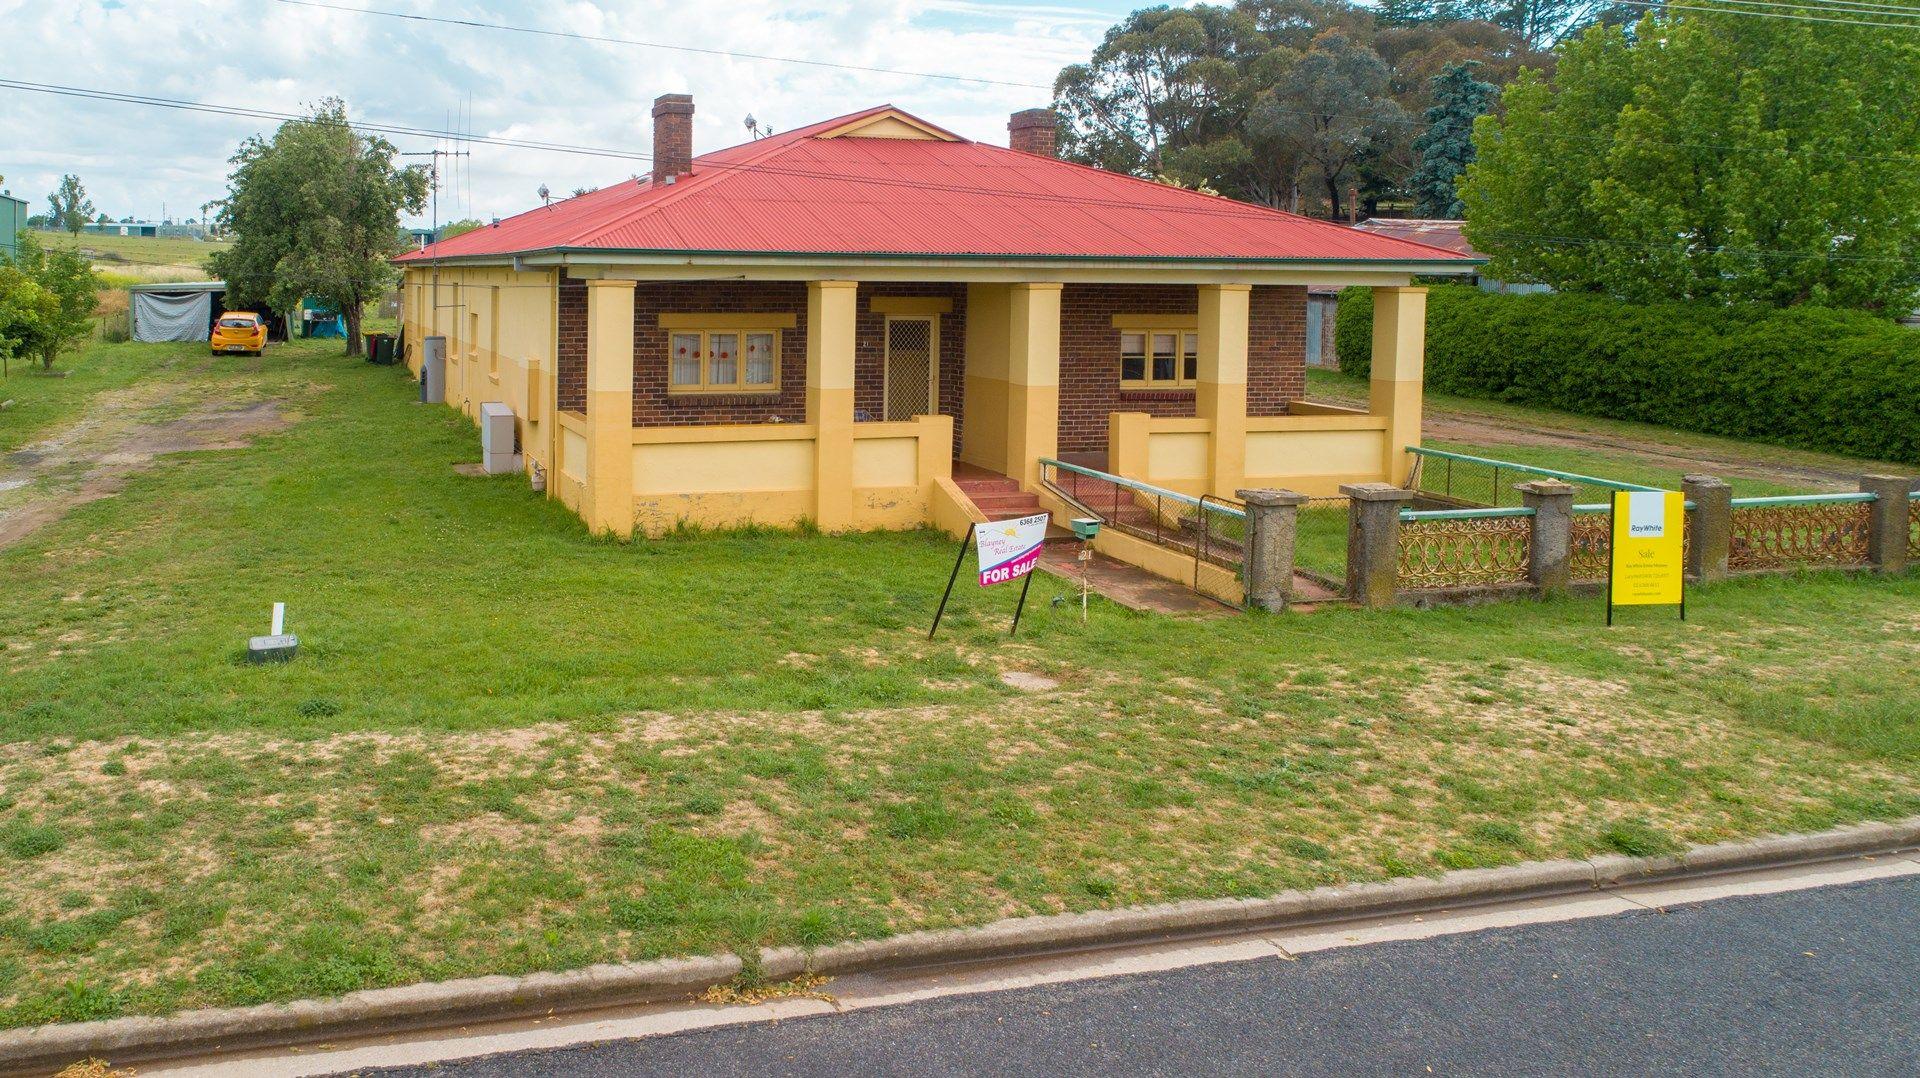 21 & 23 Hill Street, Blayney NSW 2799, Image 0